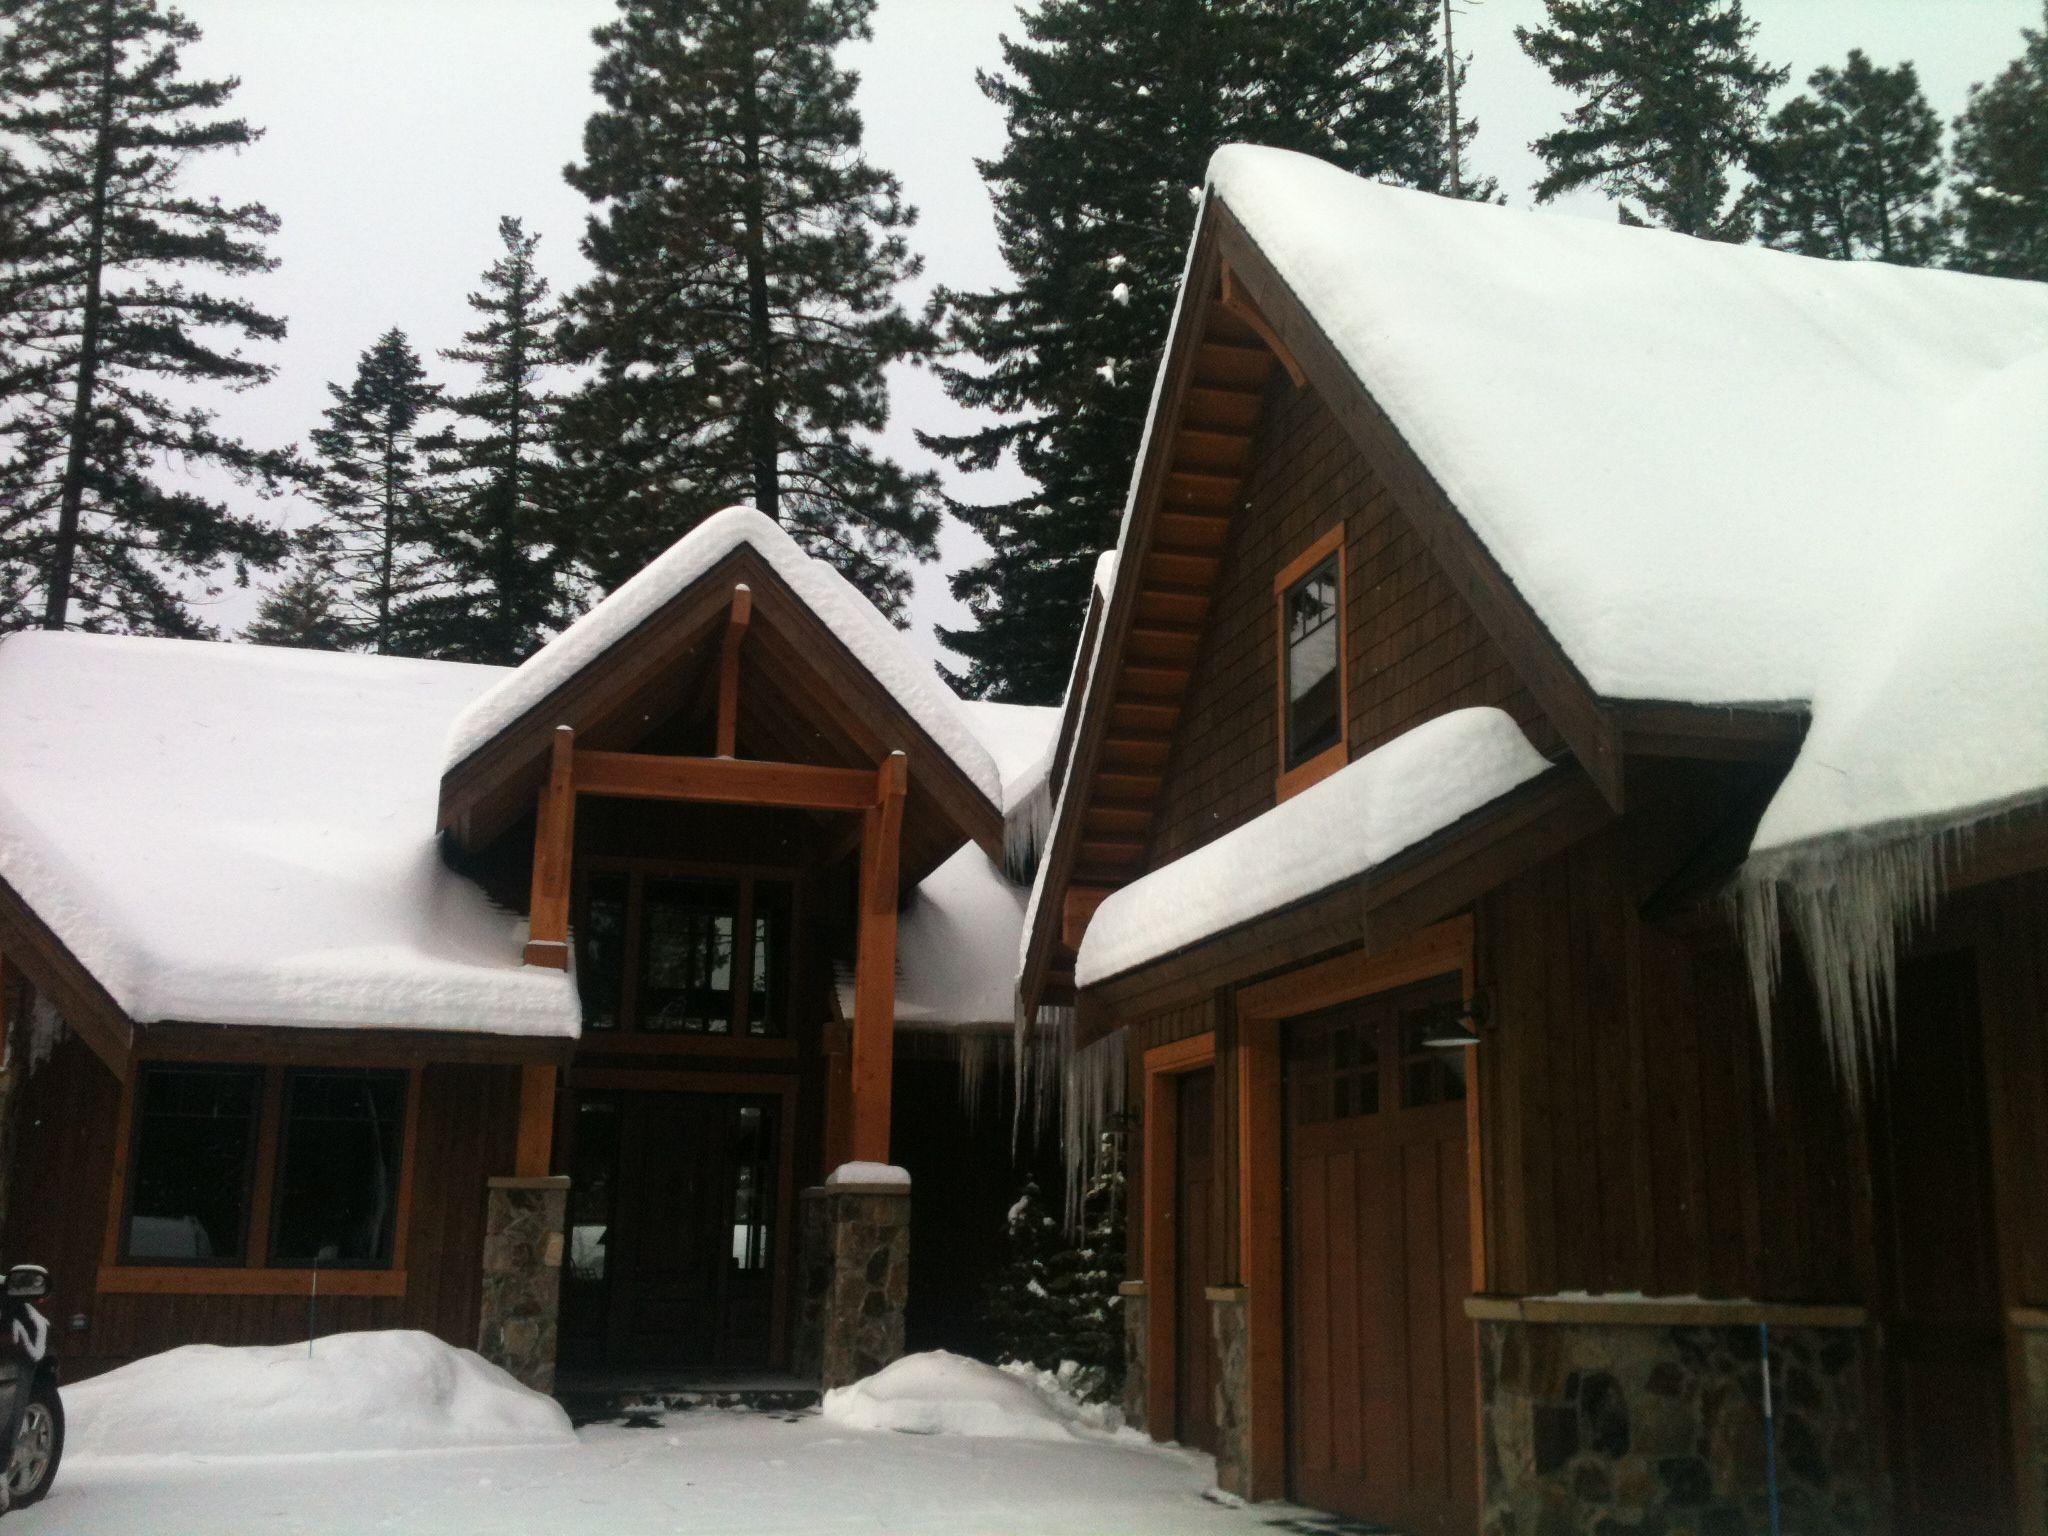 The Suncadia House in Winter